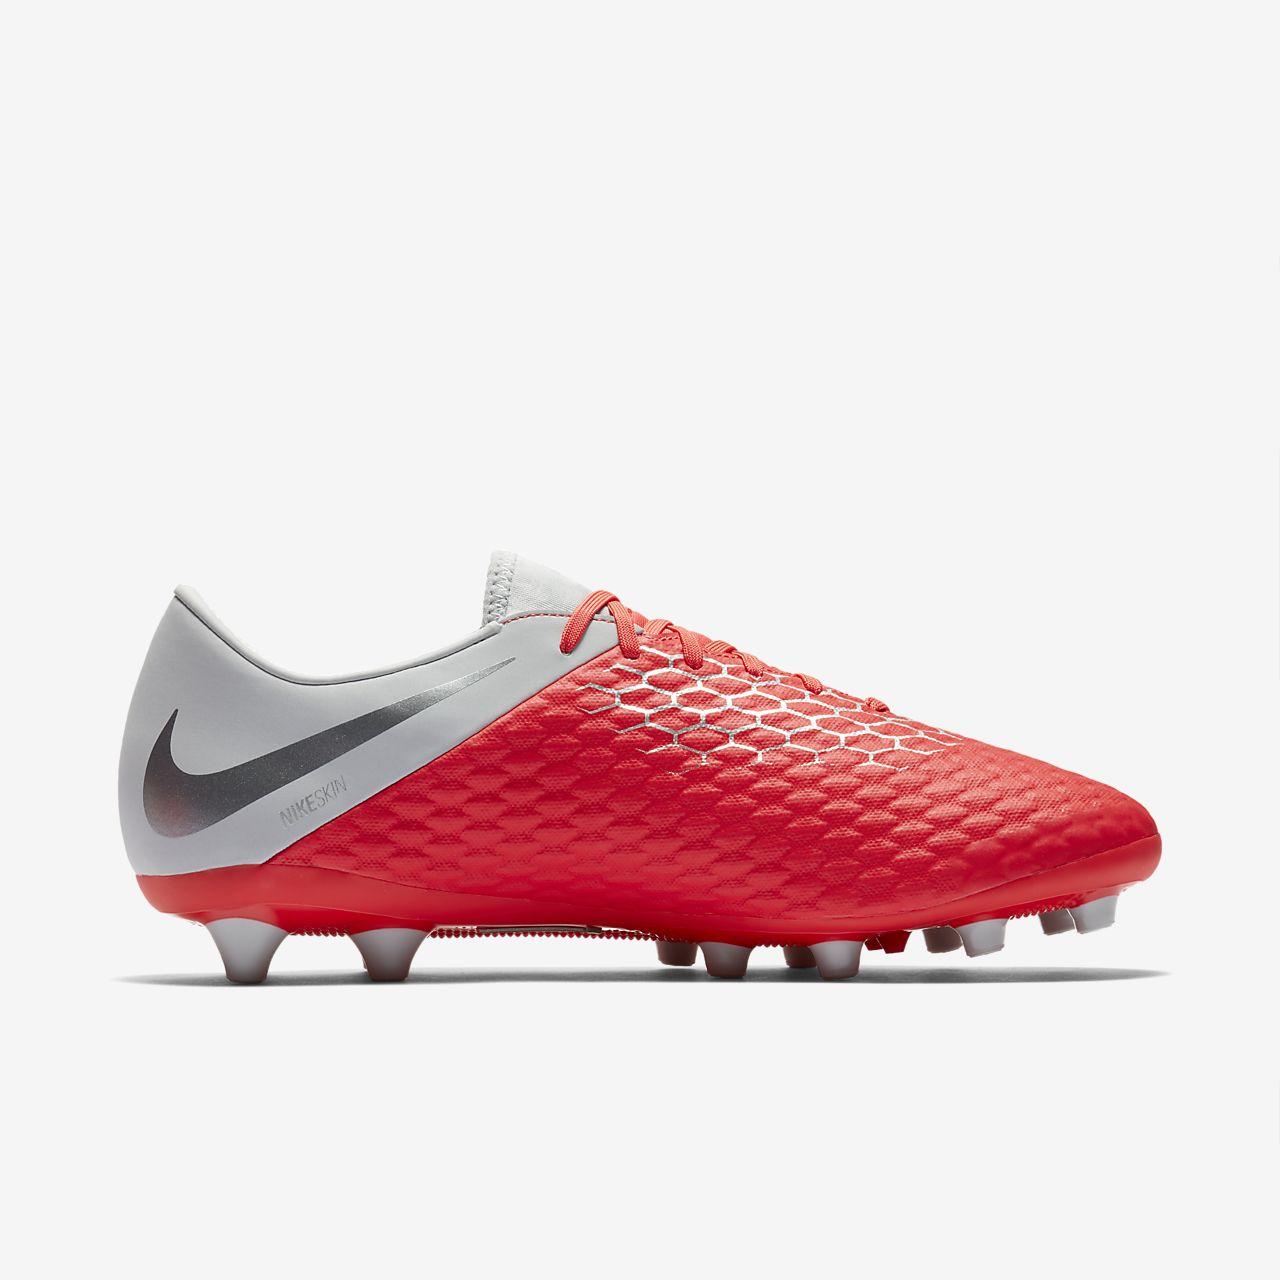 0174fa68f Nike Hypervenom III Academy AG-PRO Artificial-Grass Football Boot ...